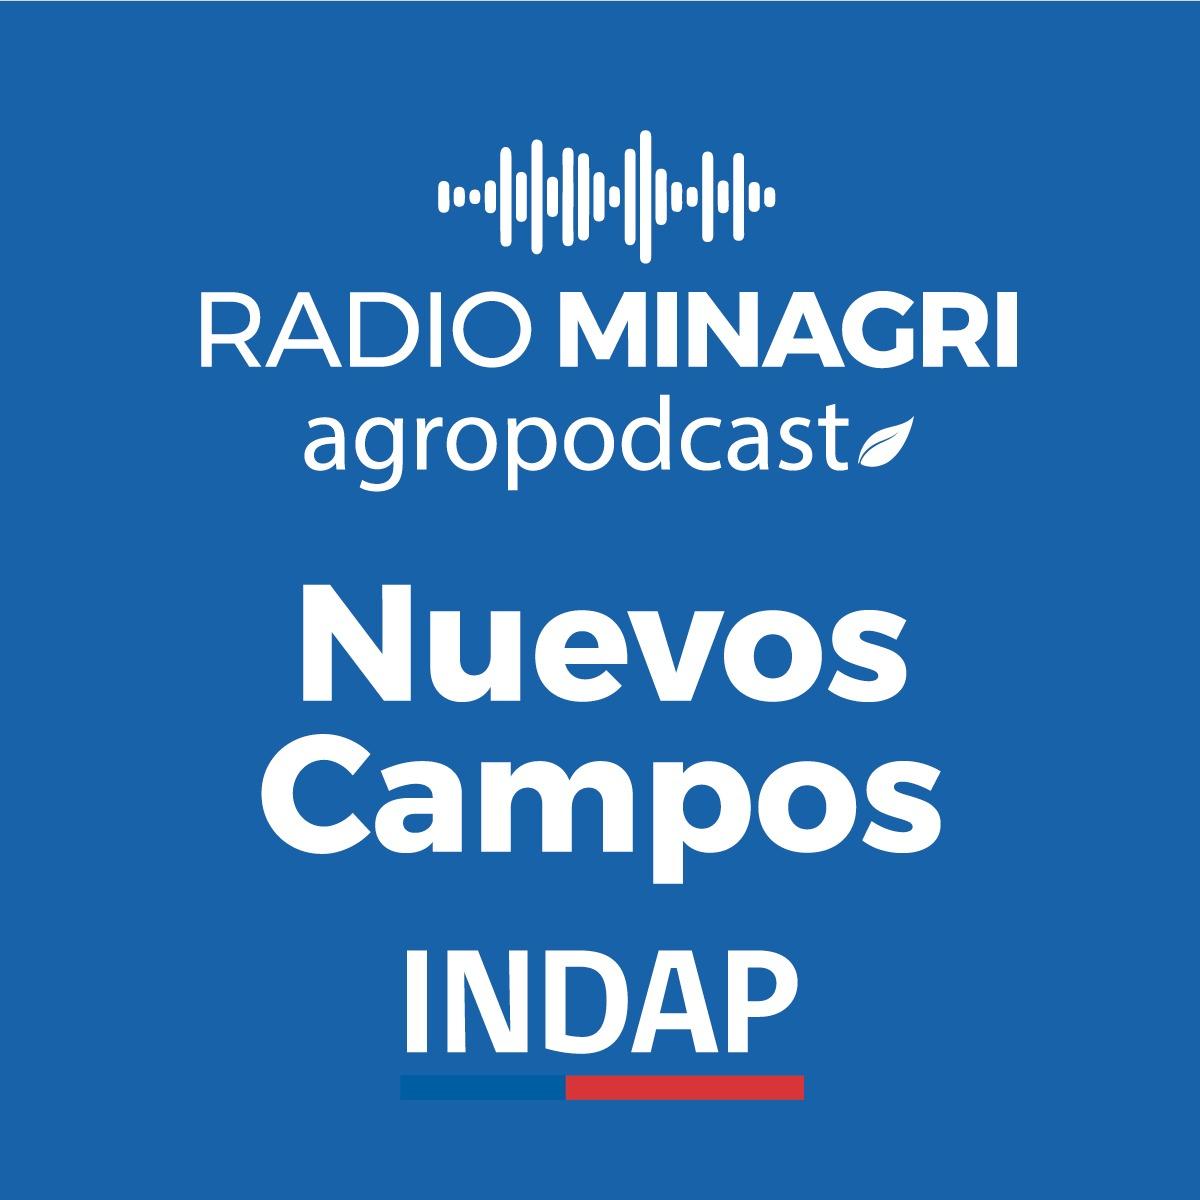 Nuevos campos – Episodio 57: Novedades de Expo Chile Agrícola 2021